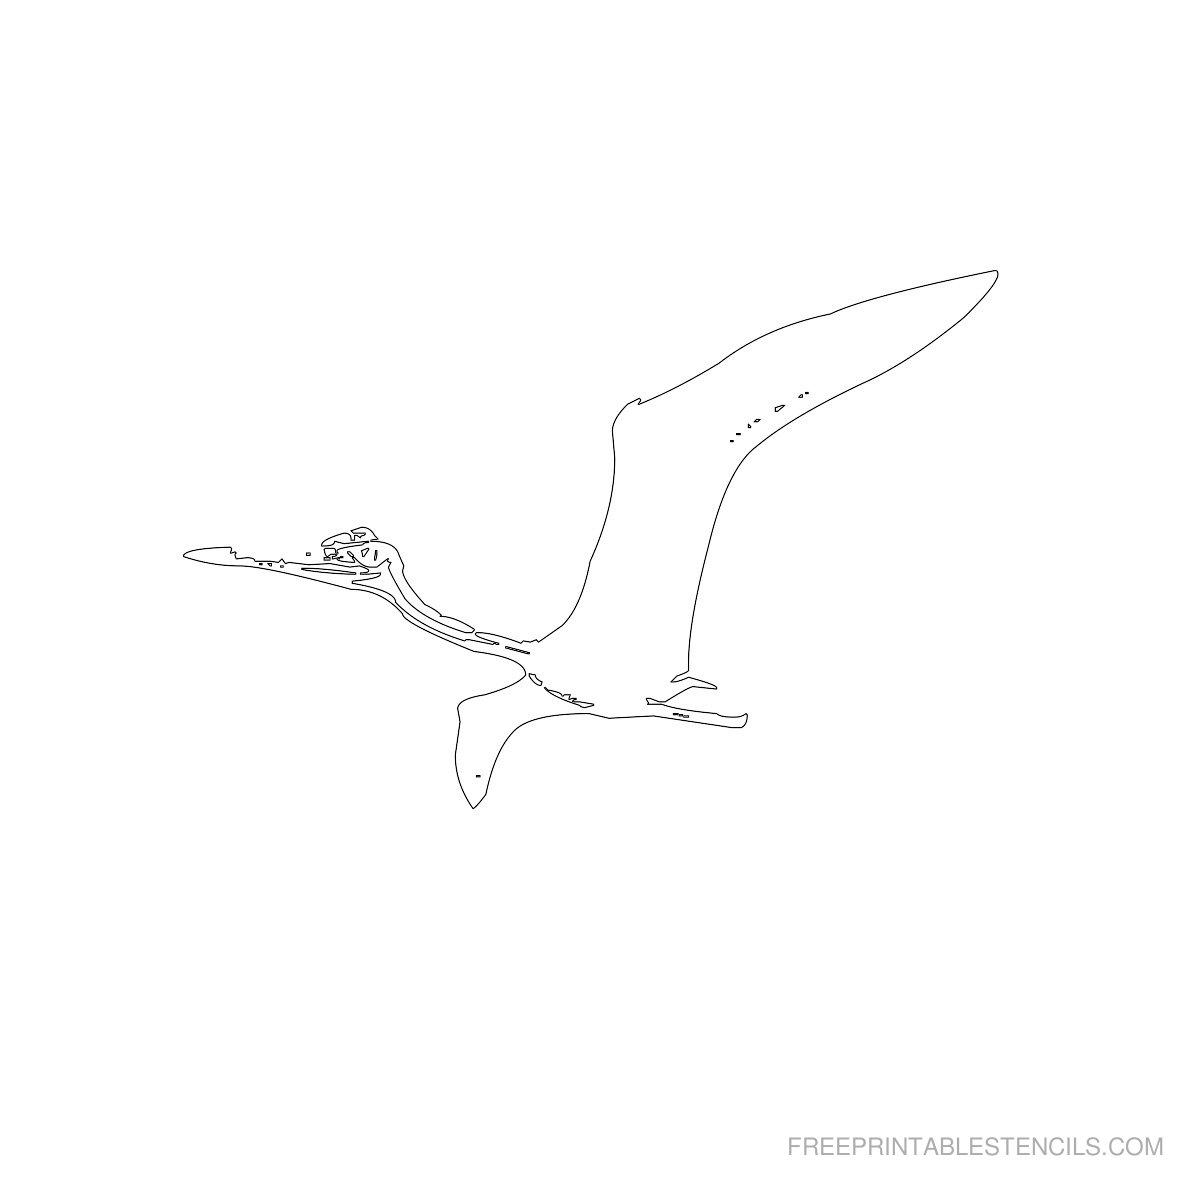 Free Printable Dinosaur Stencil I